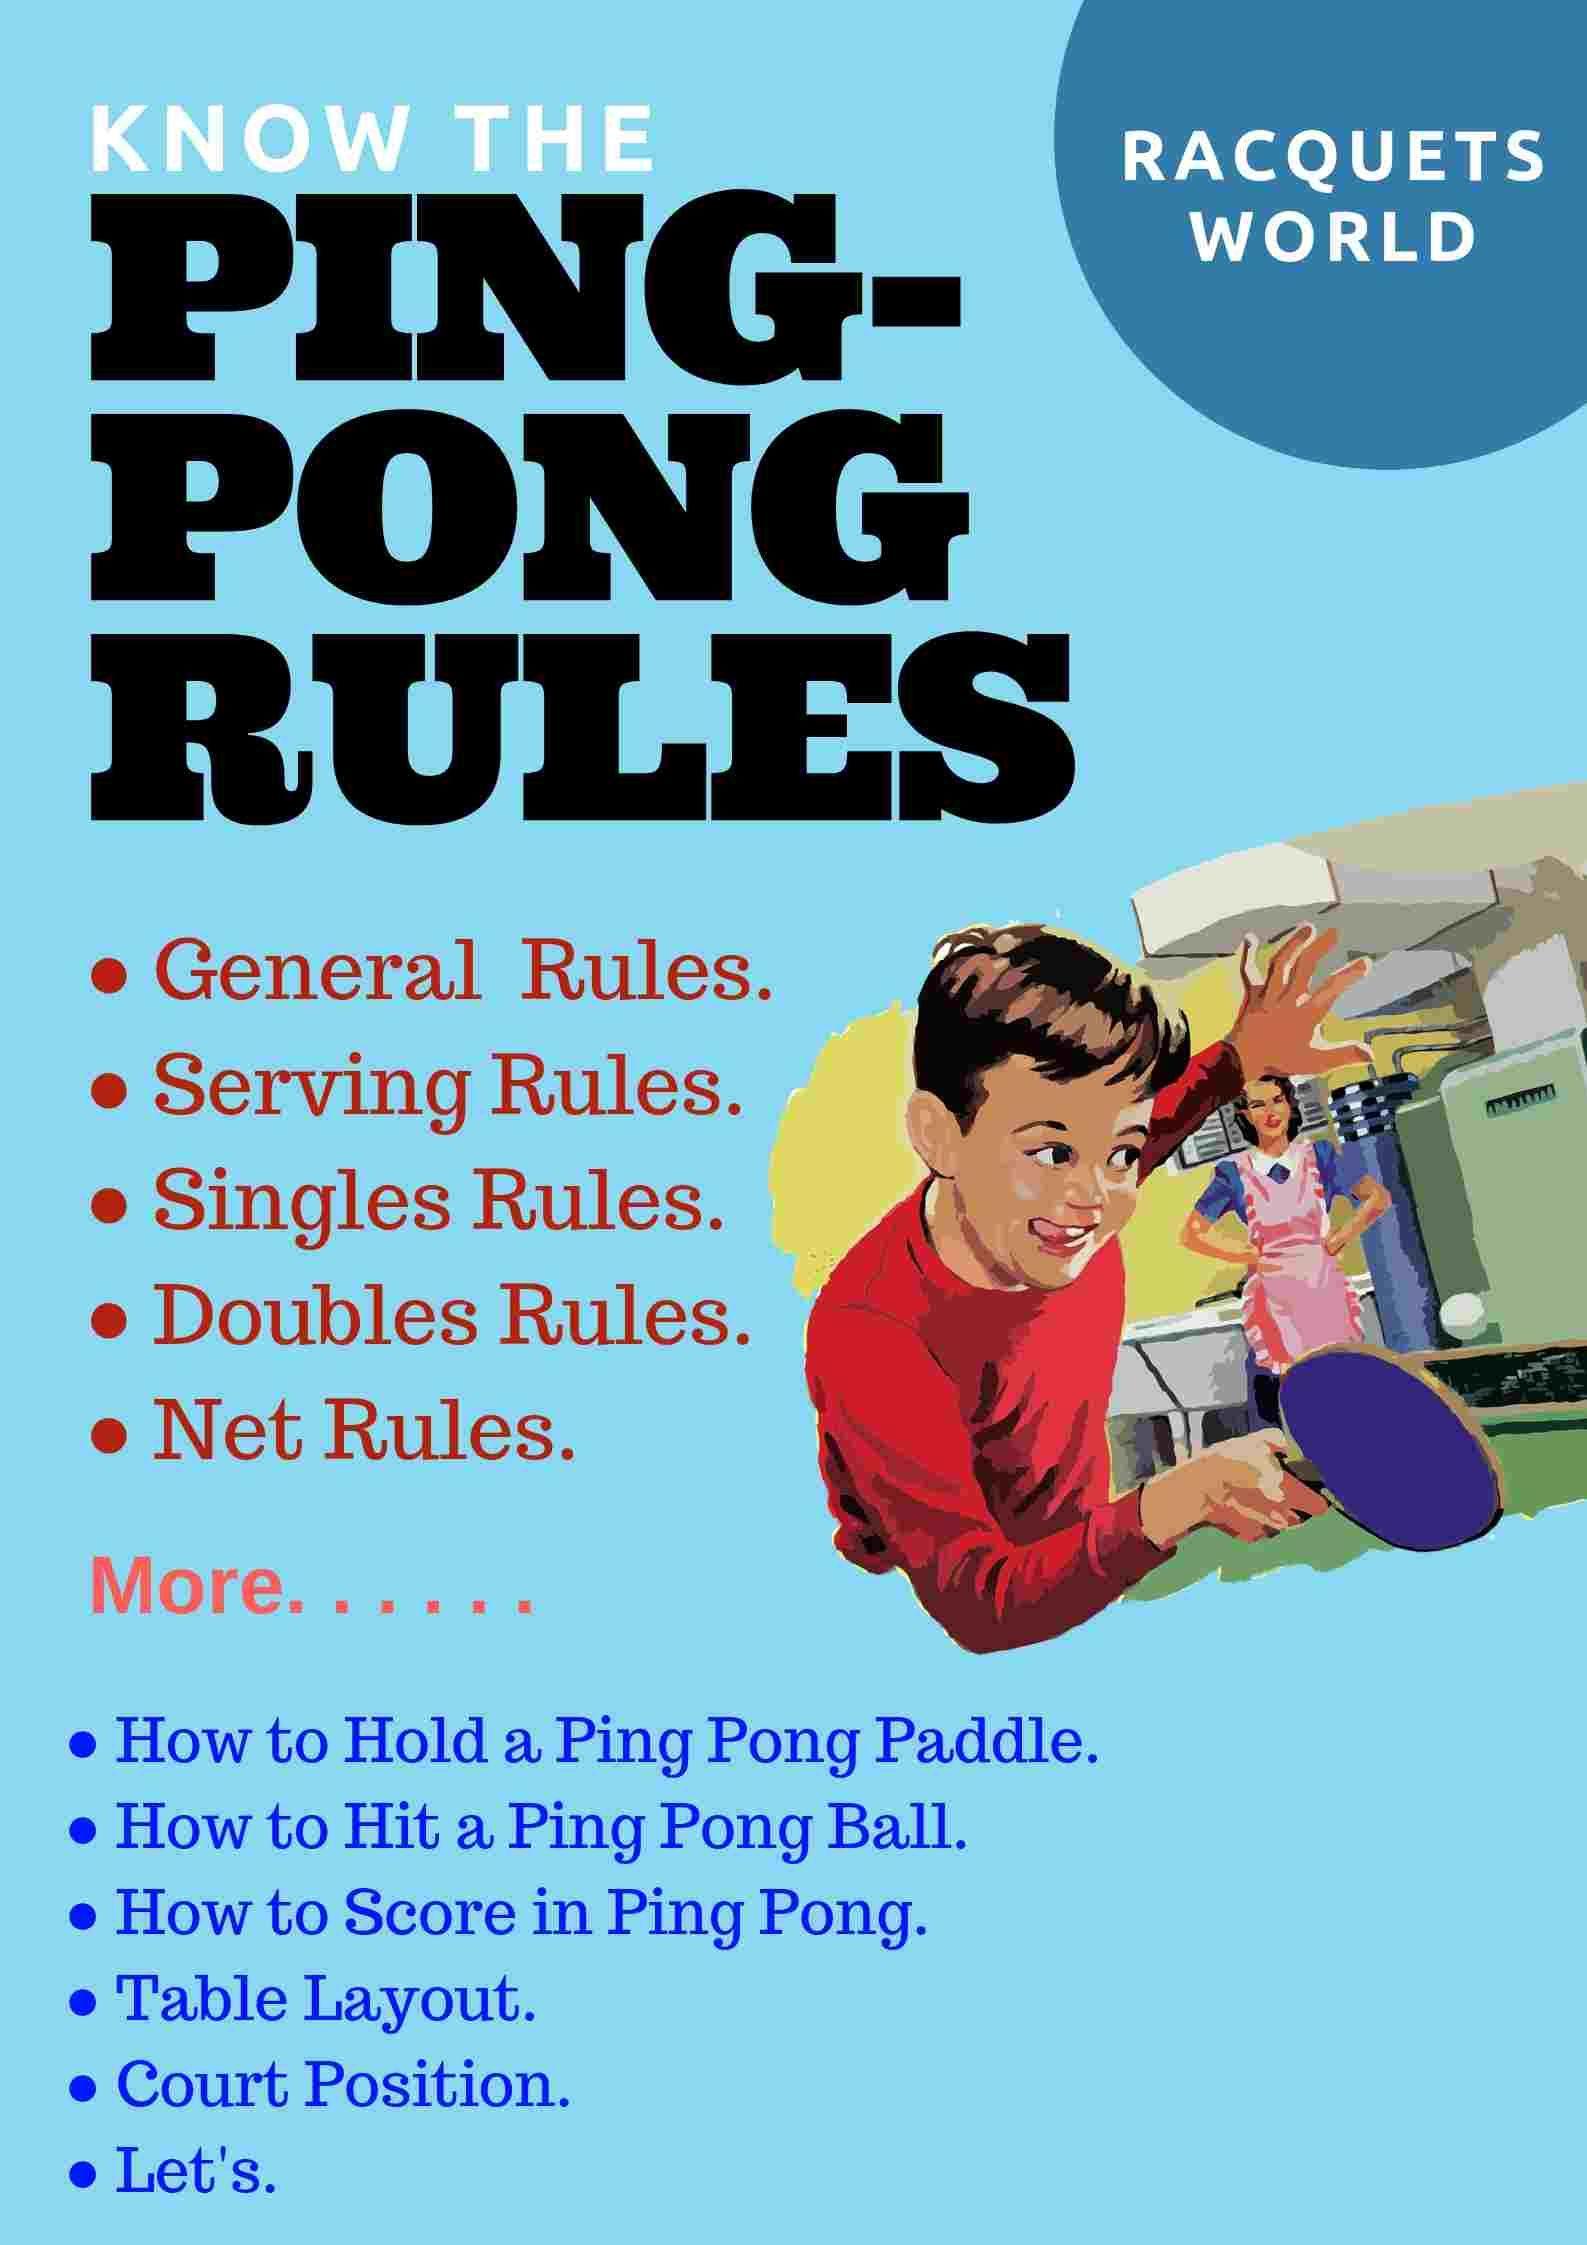 how to play ping pong Ping pong, Ping, Ping pong paddles